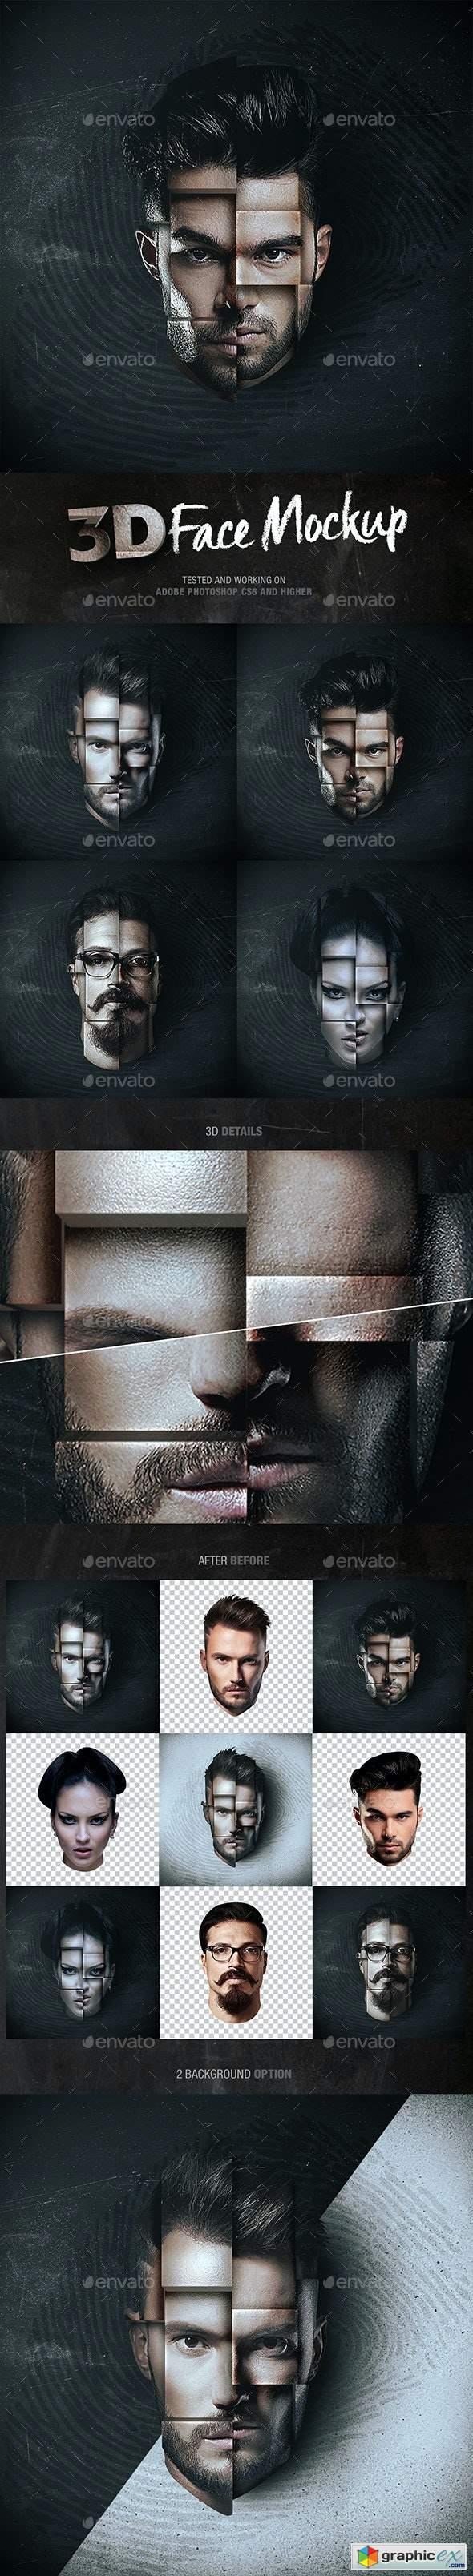 3D Face Mockup